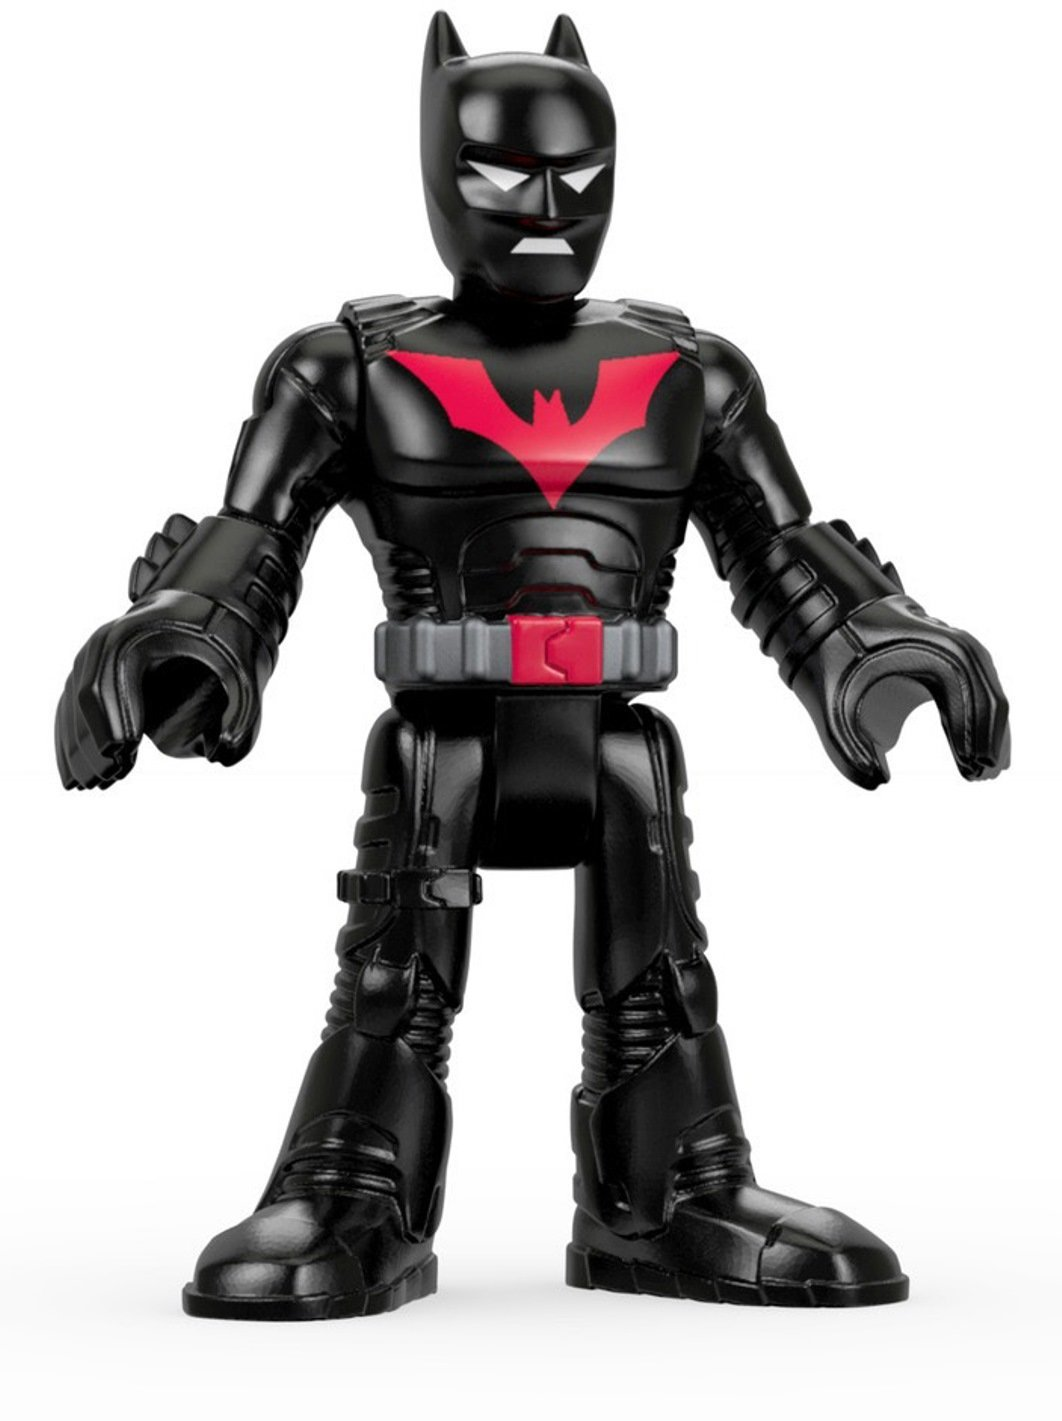 SGTOYS S02B Fashionable Men/'s Leather Suit Clothes Suit F PH HT COOMODEL Doll